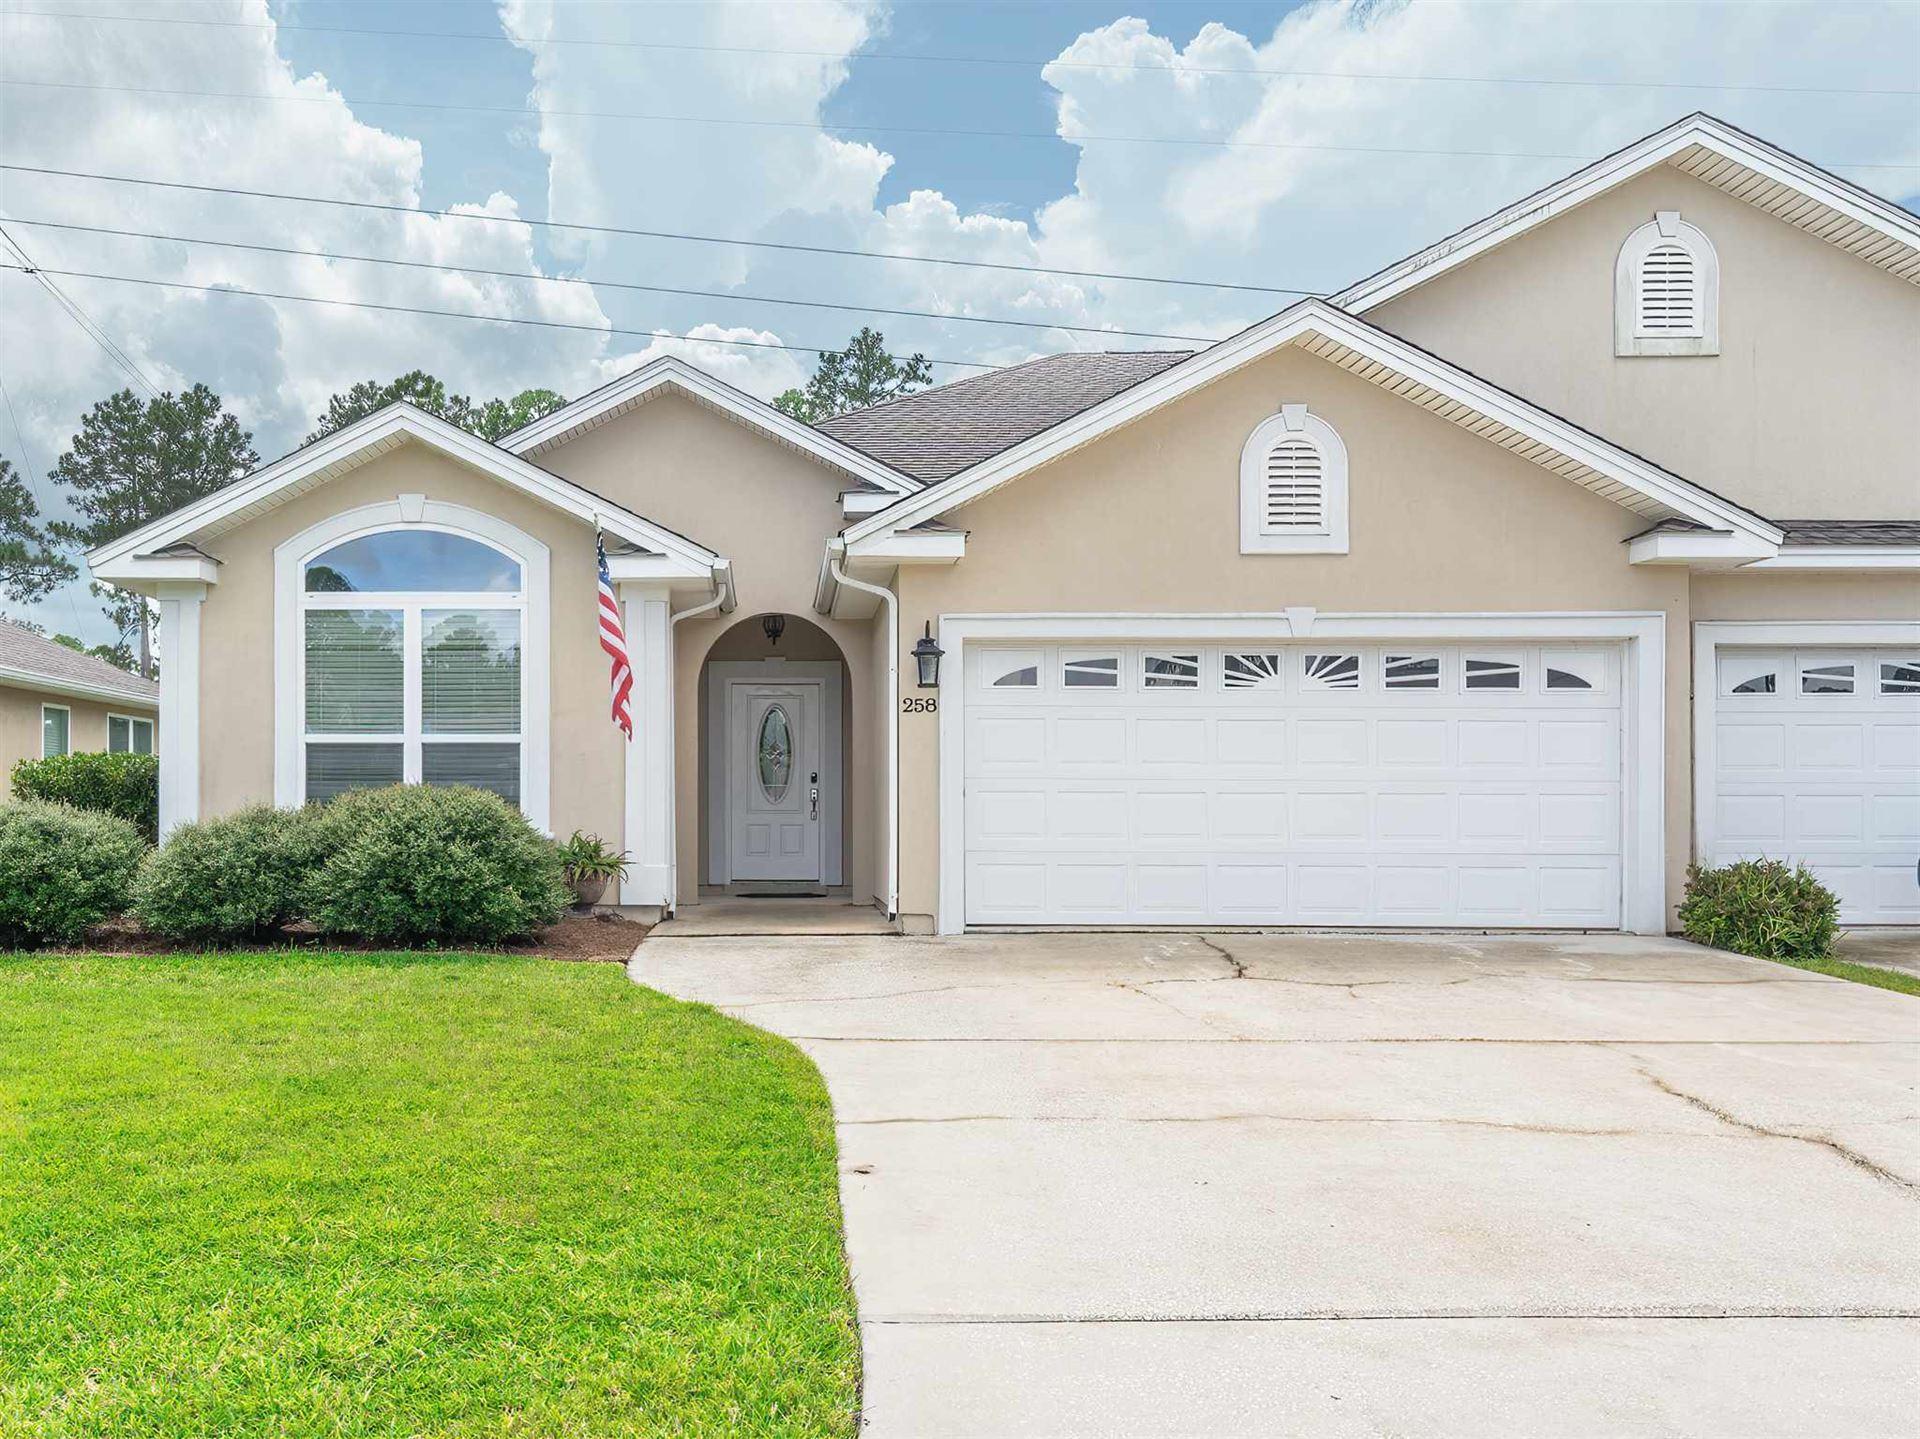 258 Laurel Landing Blvd, Kingsland, GA 31548 - MLS#: 8855111